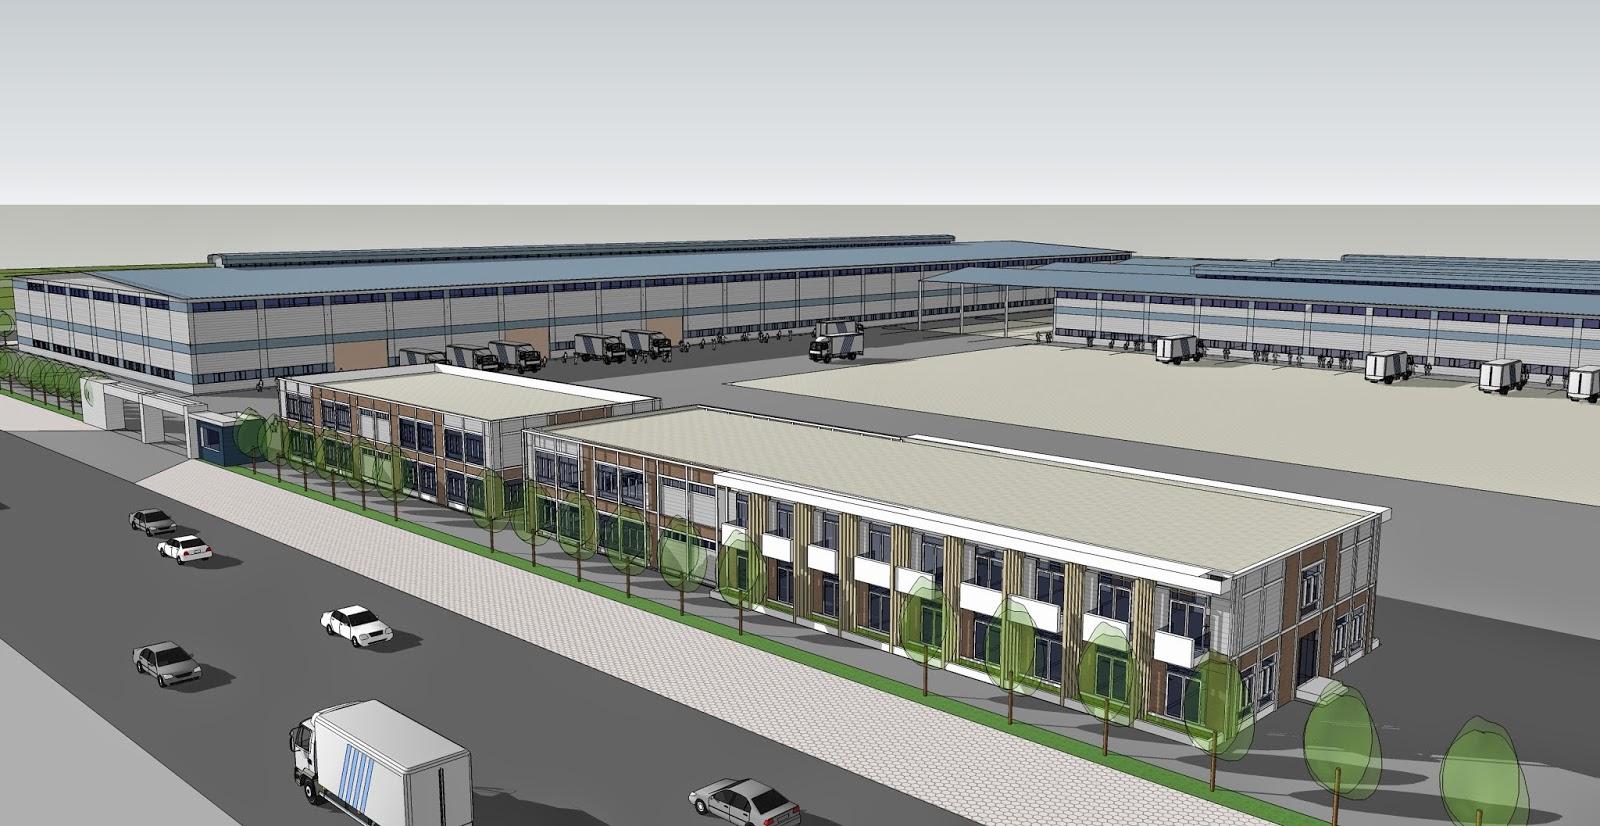 ADD 건축 Group / 플랜 애드 건축사 사무소: March 2014